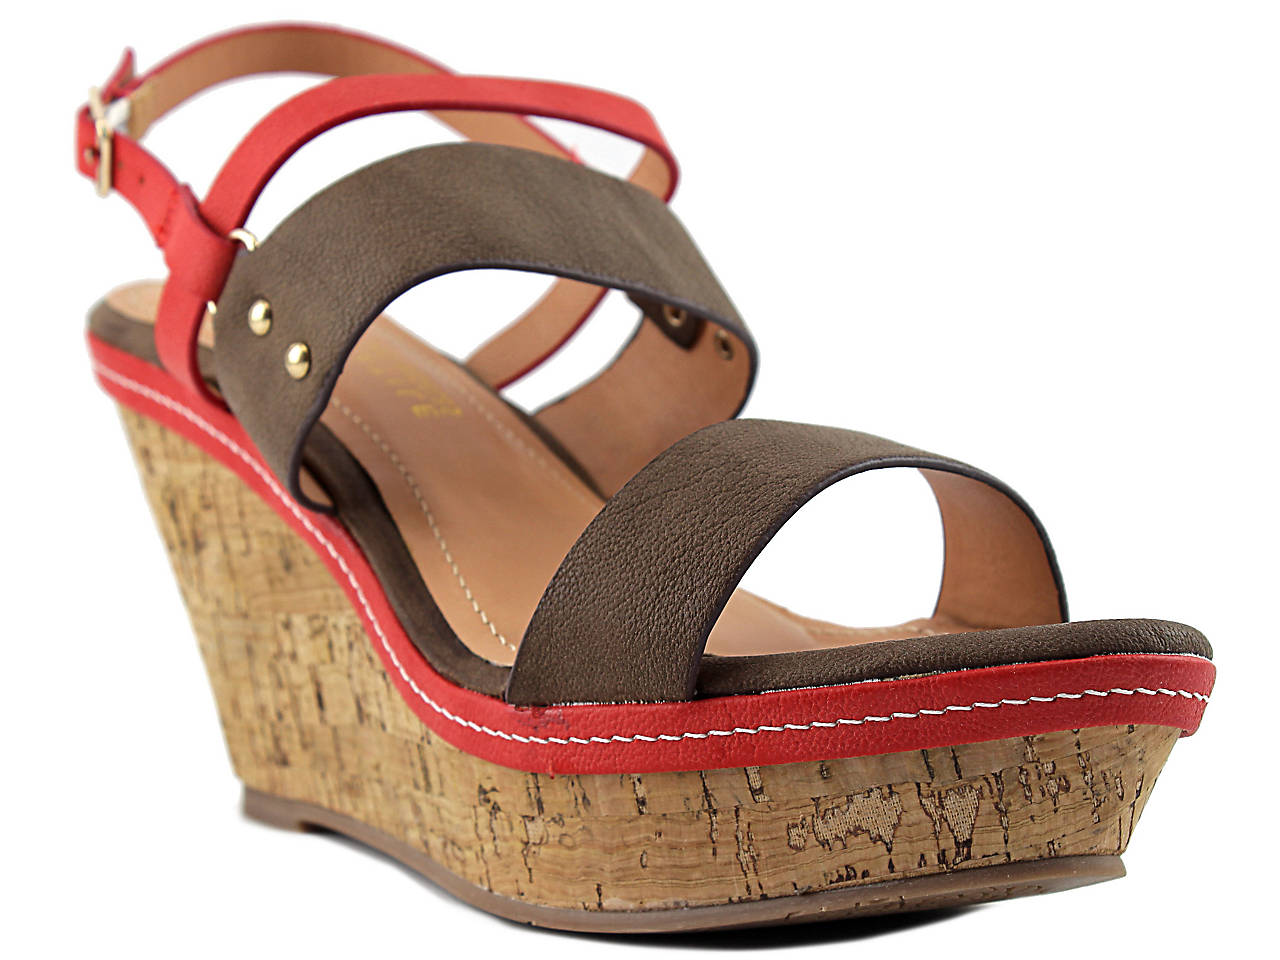 cc3f59bef Very Volatile Zaria Wedge Sandal - FINAL SALE Women s Shoes